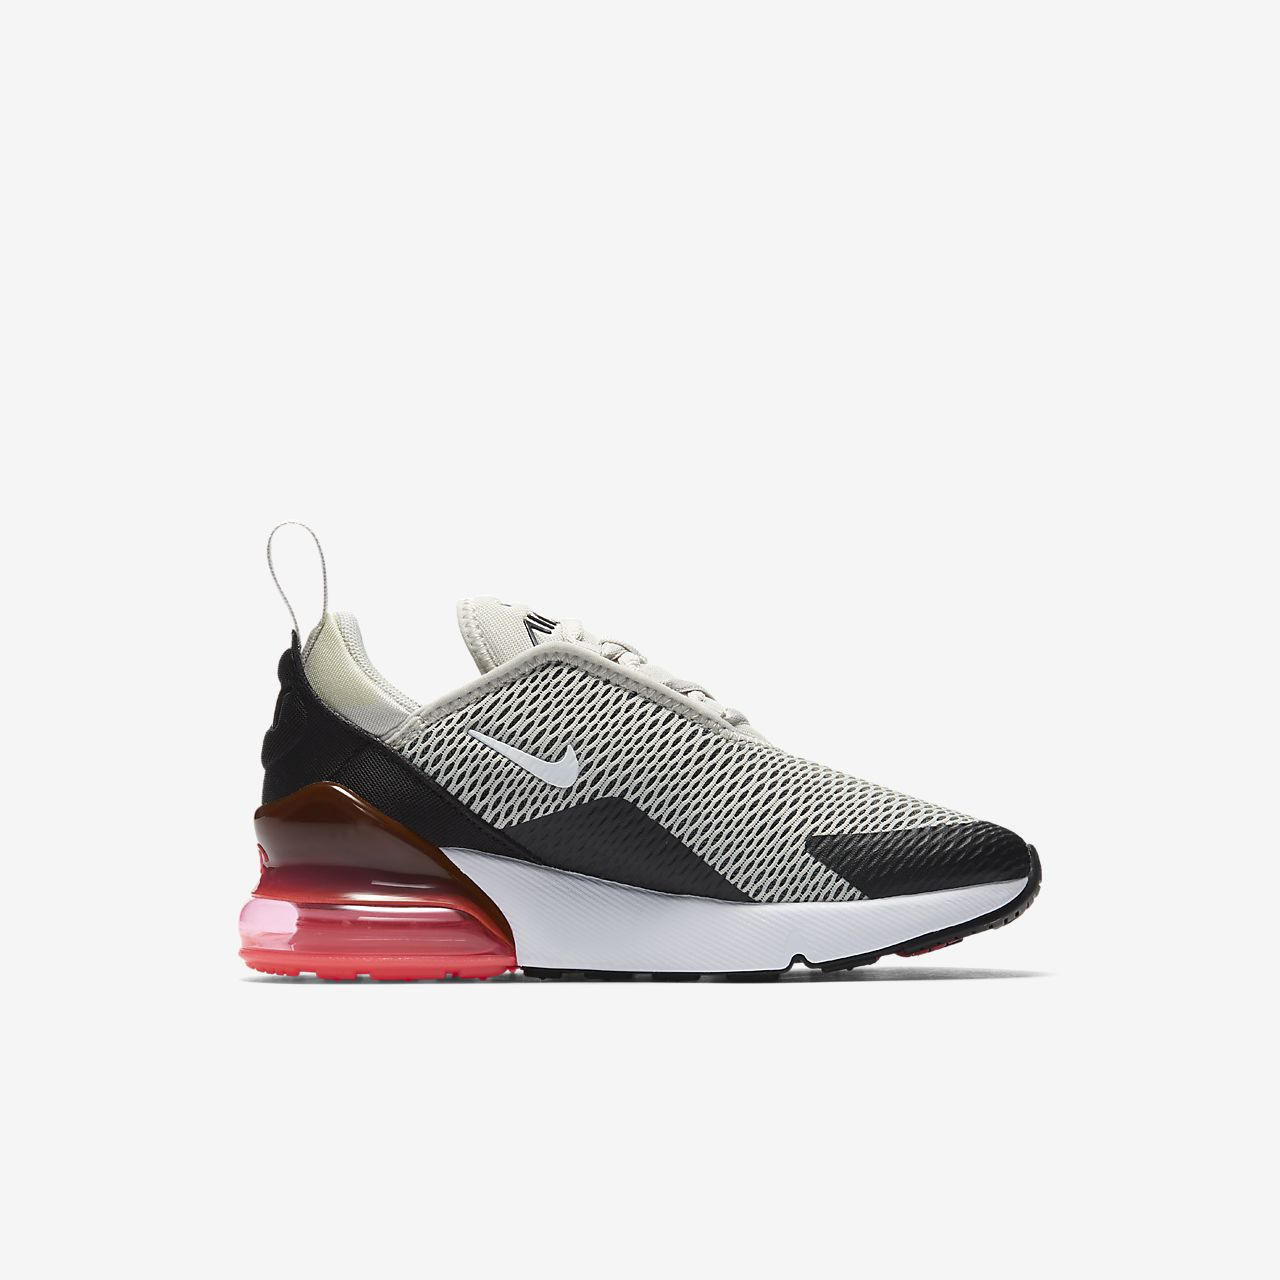 scarpe nike air max 270 bambino